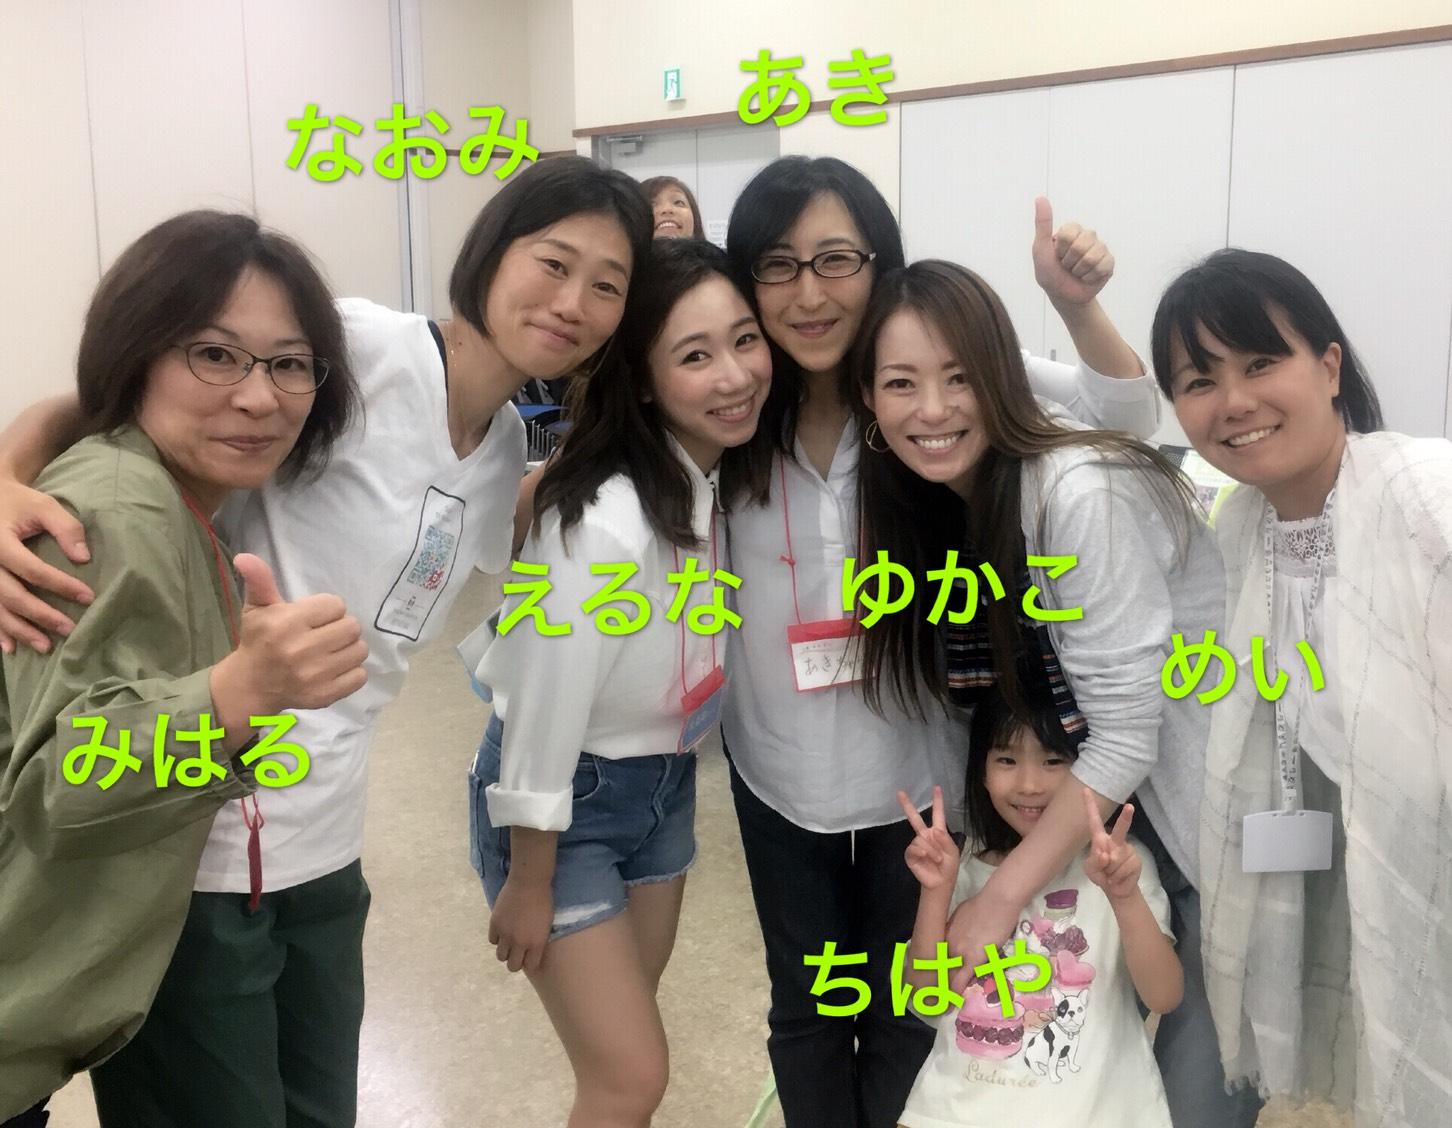 2018/8/271010HAPPY藤沢 Eグループ ①魂に響いたお話 ②感想